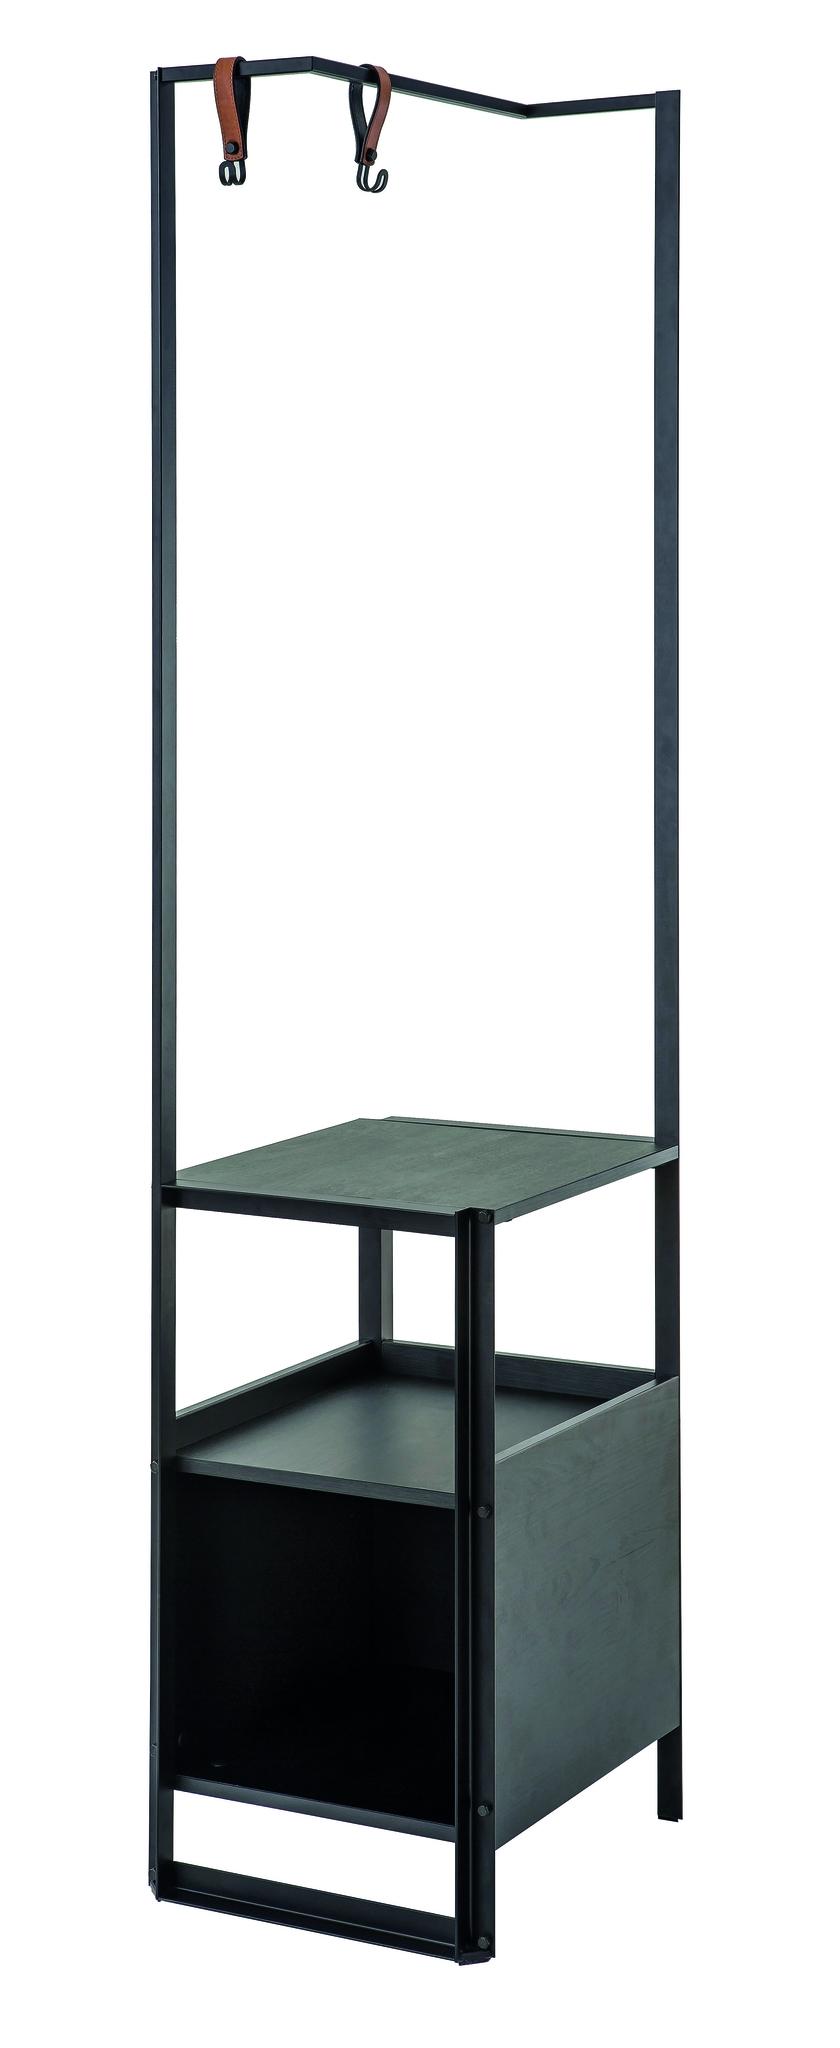 Raft cu suport umerase din pal si metal, pentru tineret Dark Metal Black / Graphite, l40xA48xH187 cm poza